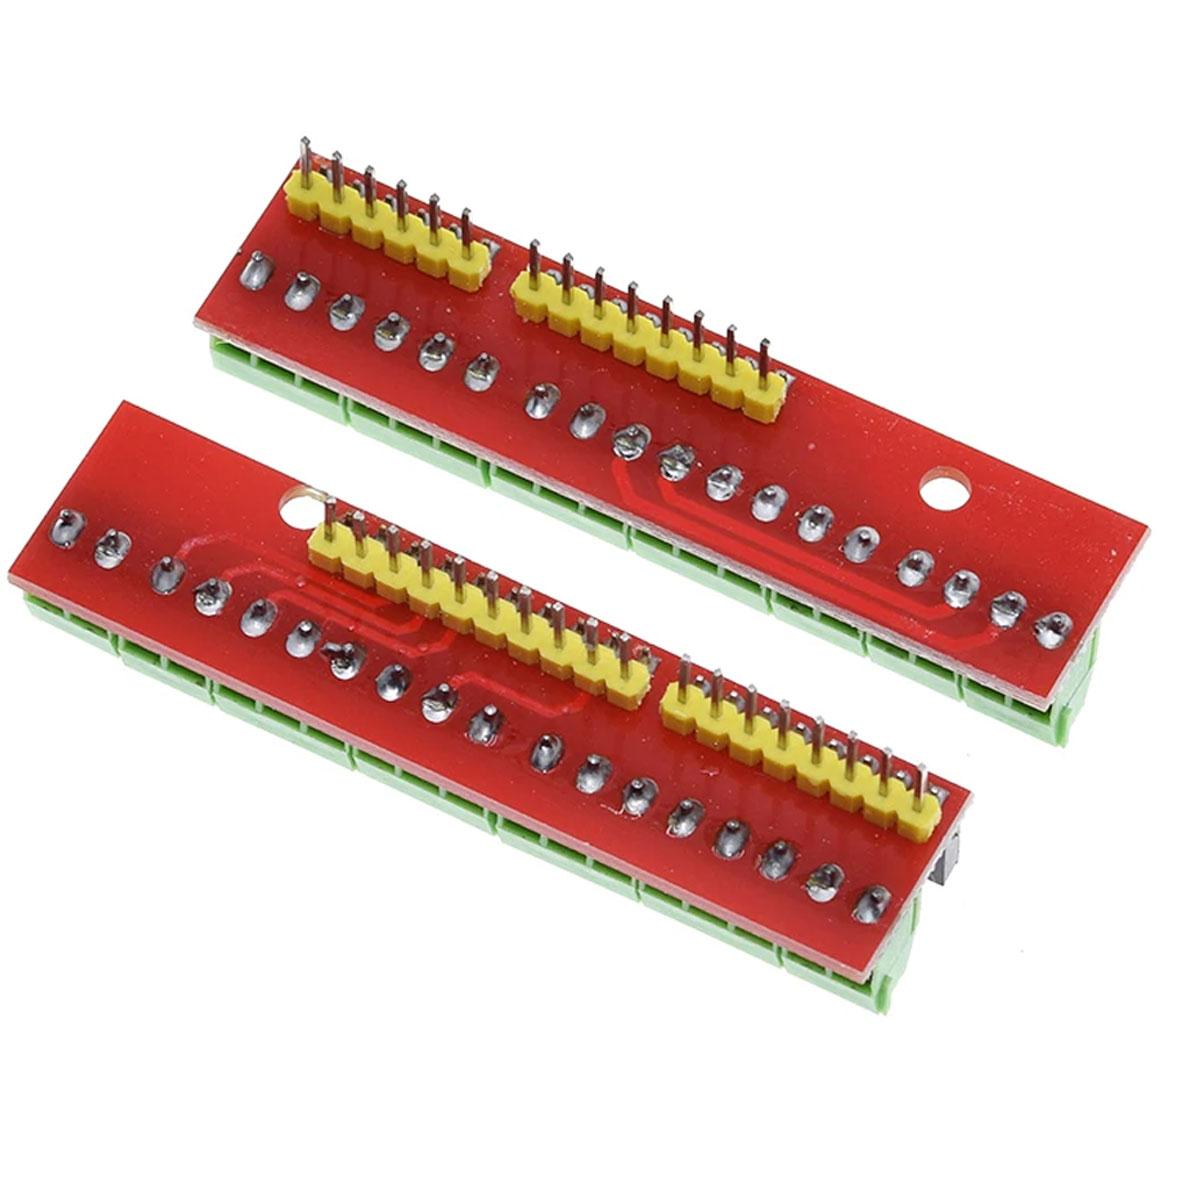 Shield Borne Terminal De Parafuso Extensor para Arduino Uno R3